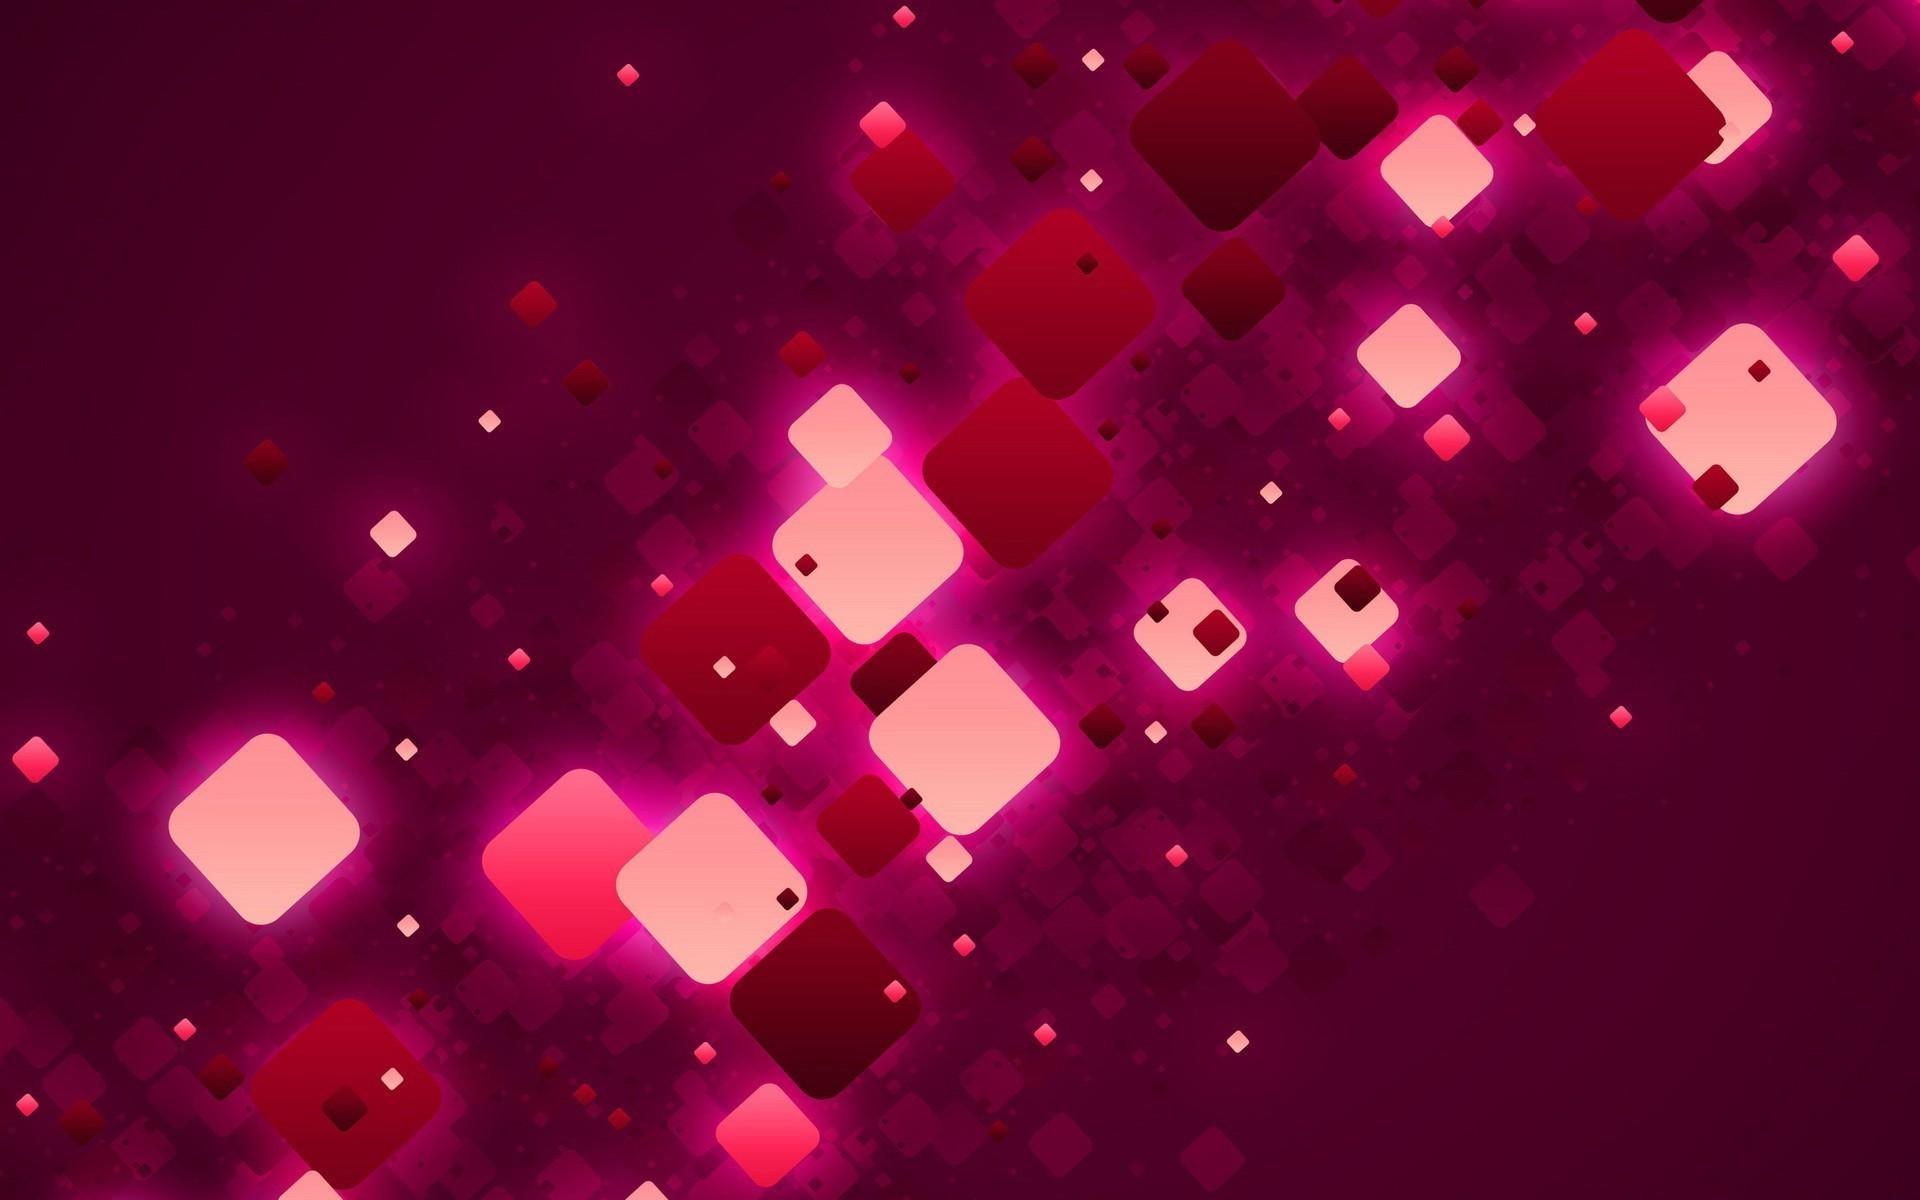 1920x1080 781440230 Biochemistry Wallpaper For PC Mobile